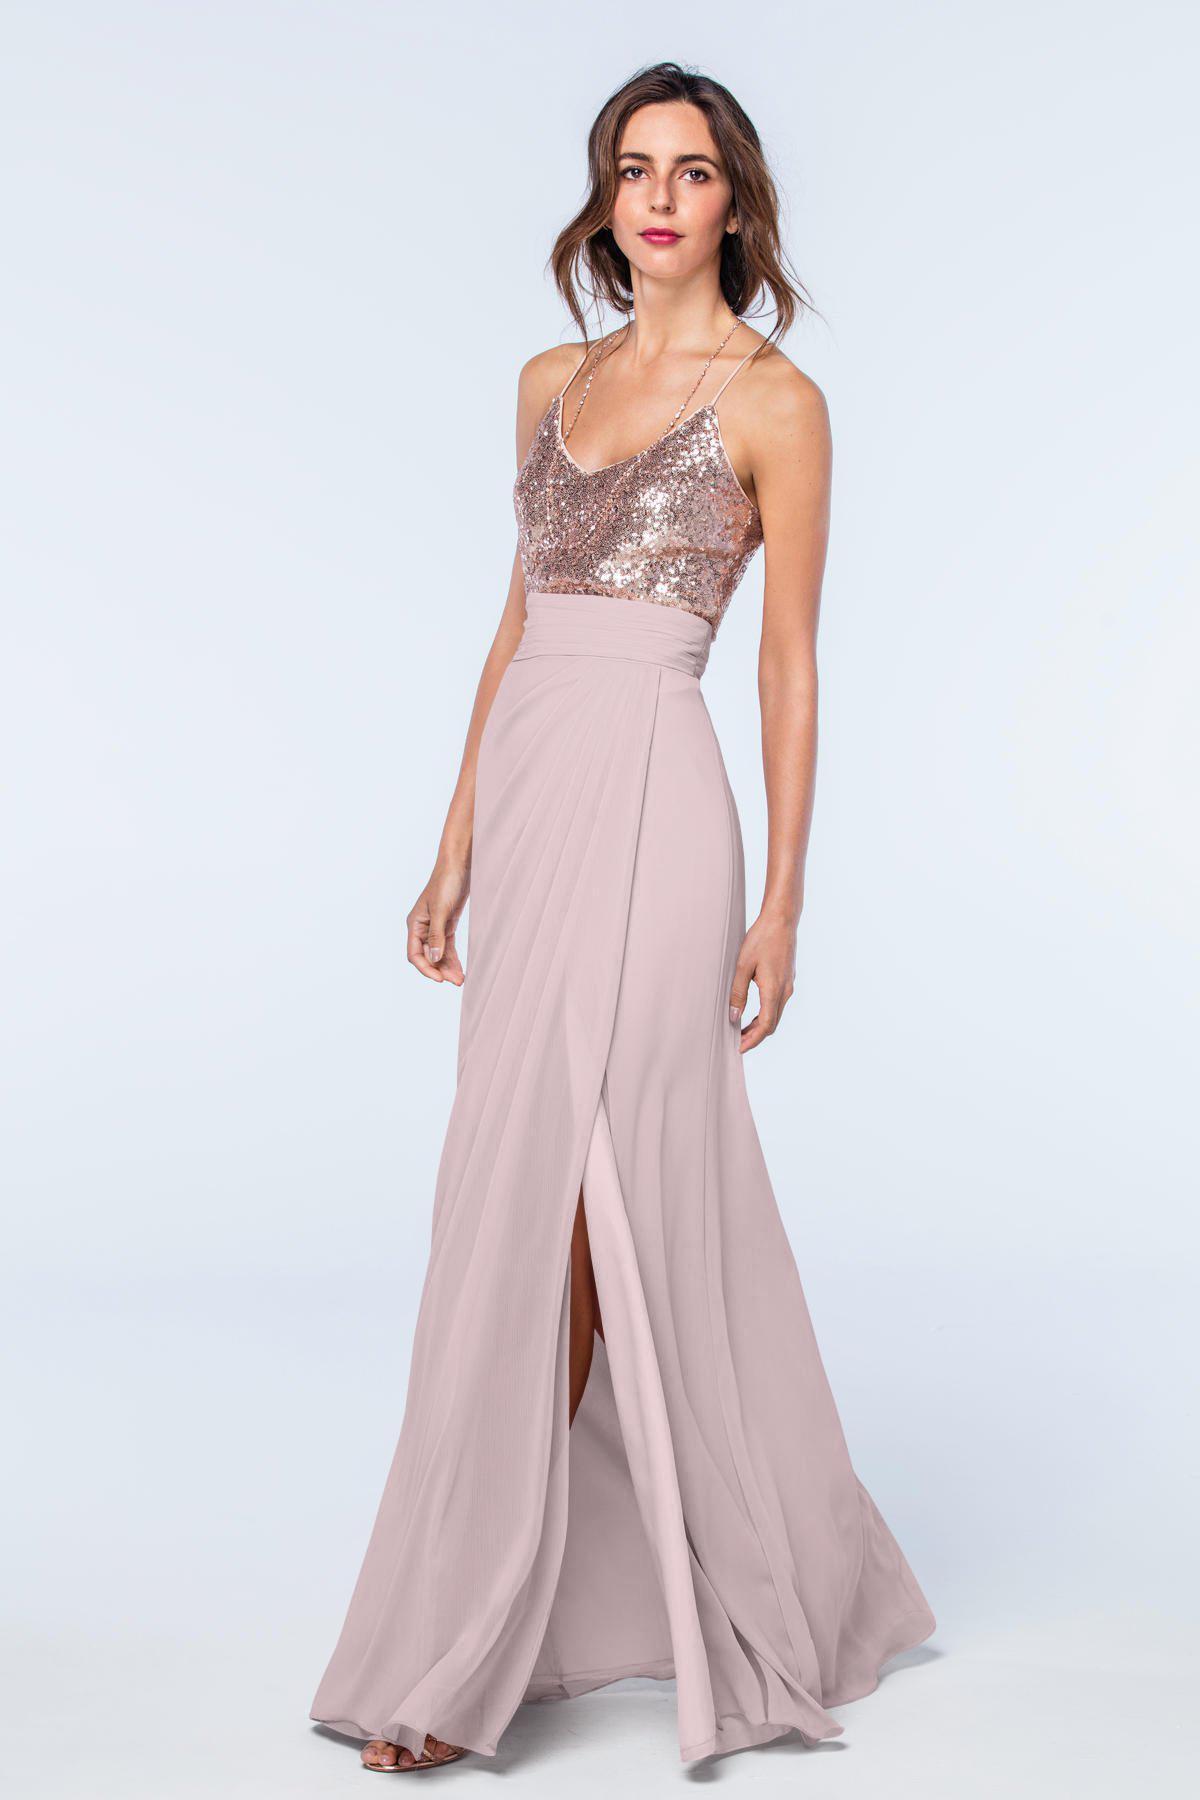 c70fcfac5ccc Natasha Skirt 2508 | Watters Bridesmaids | Watters